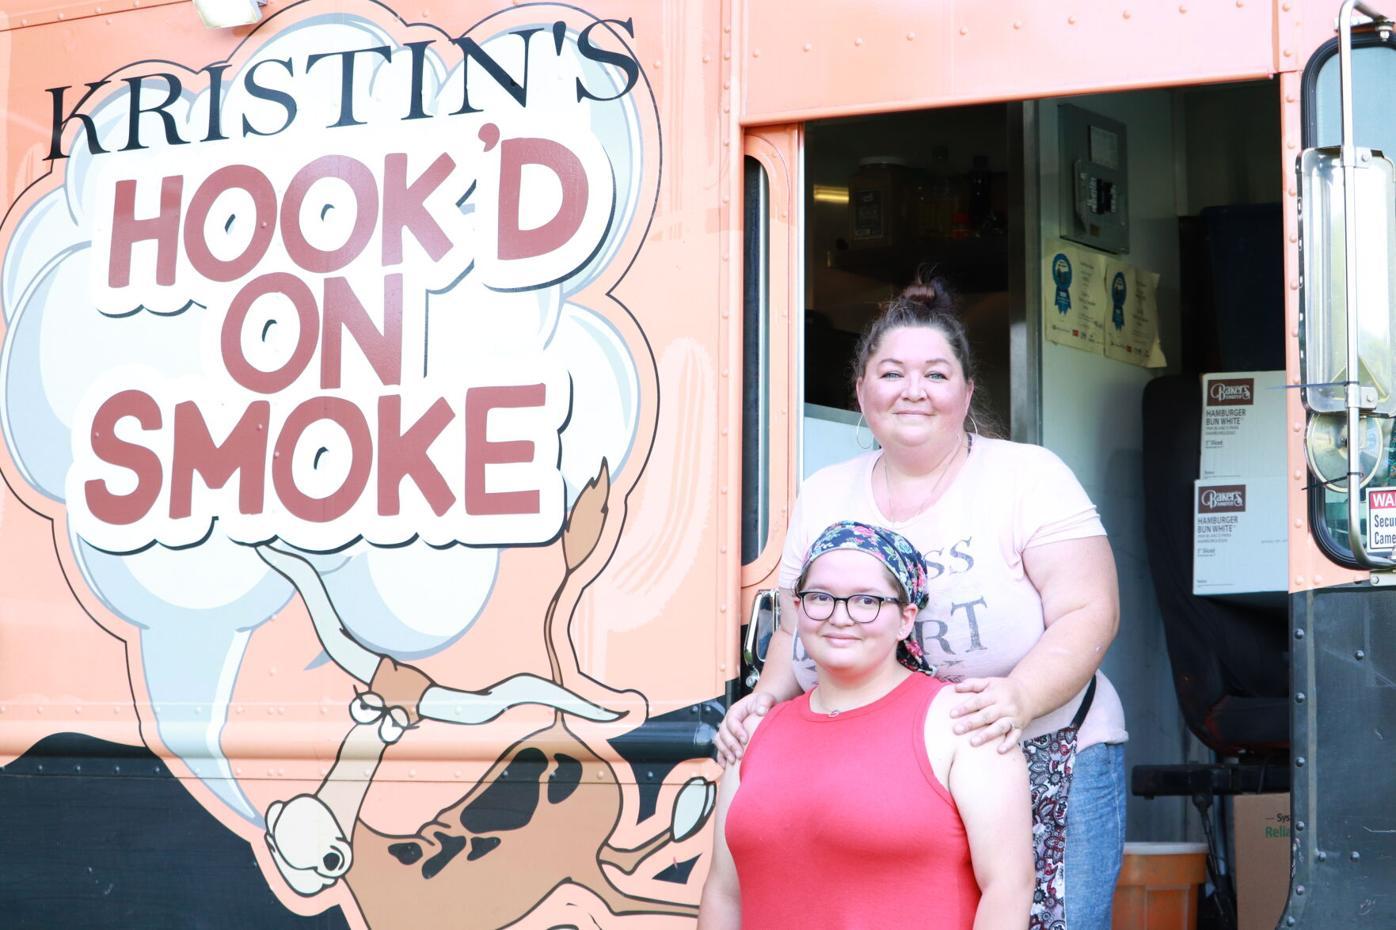 Kristin's Hook'd on Smoke